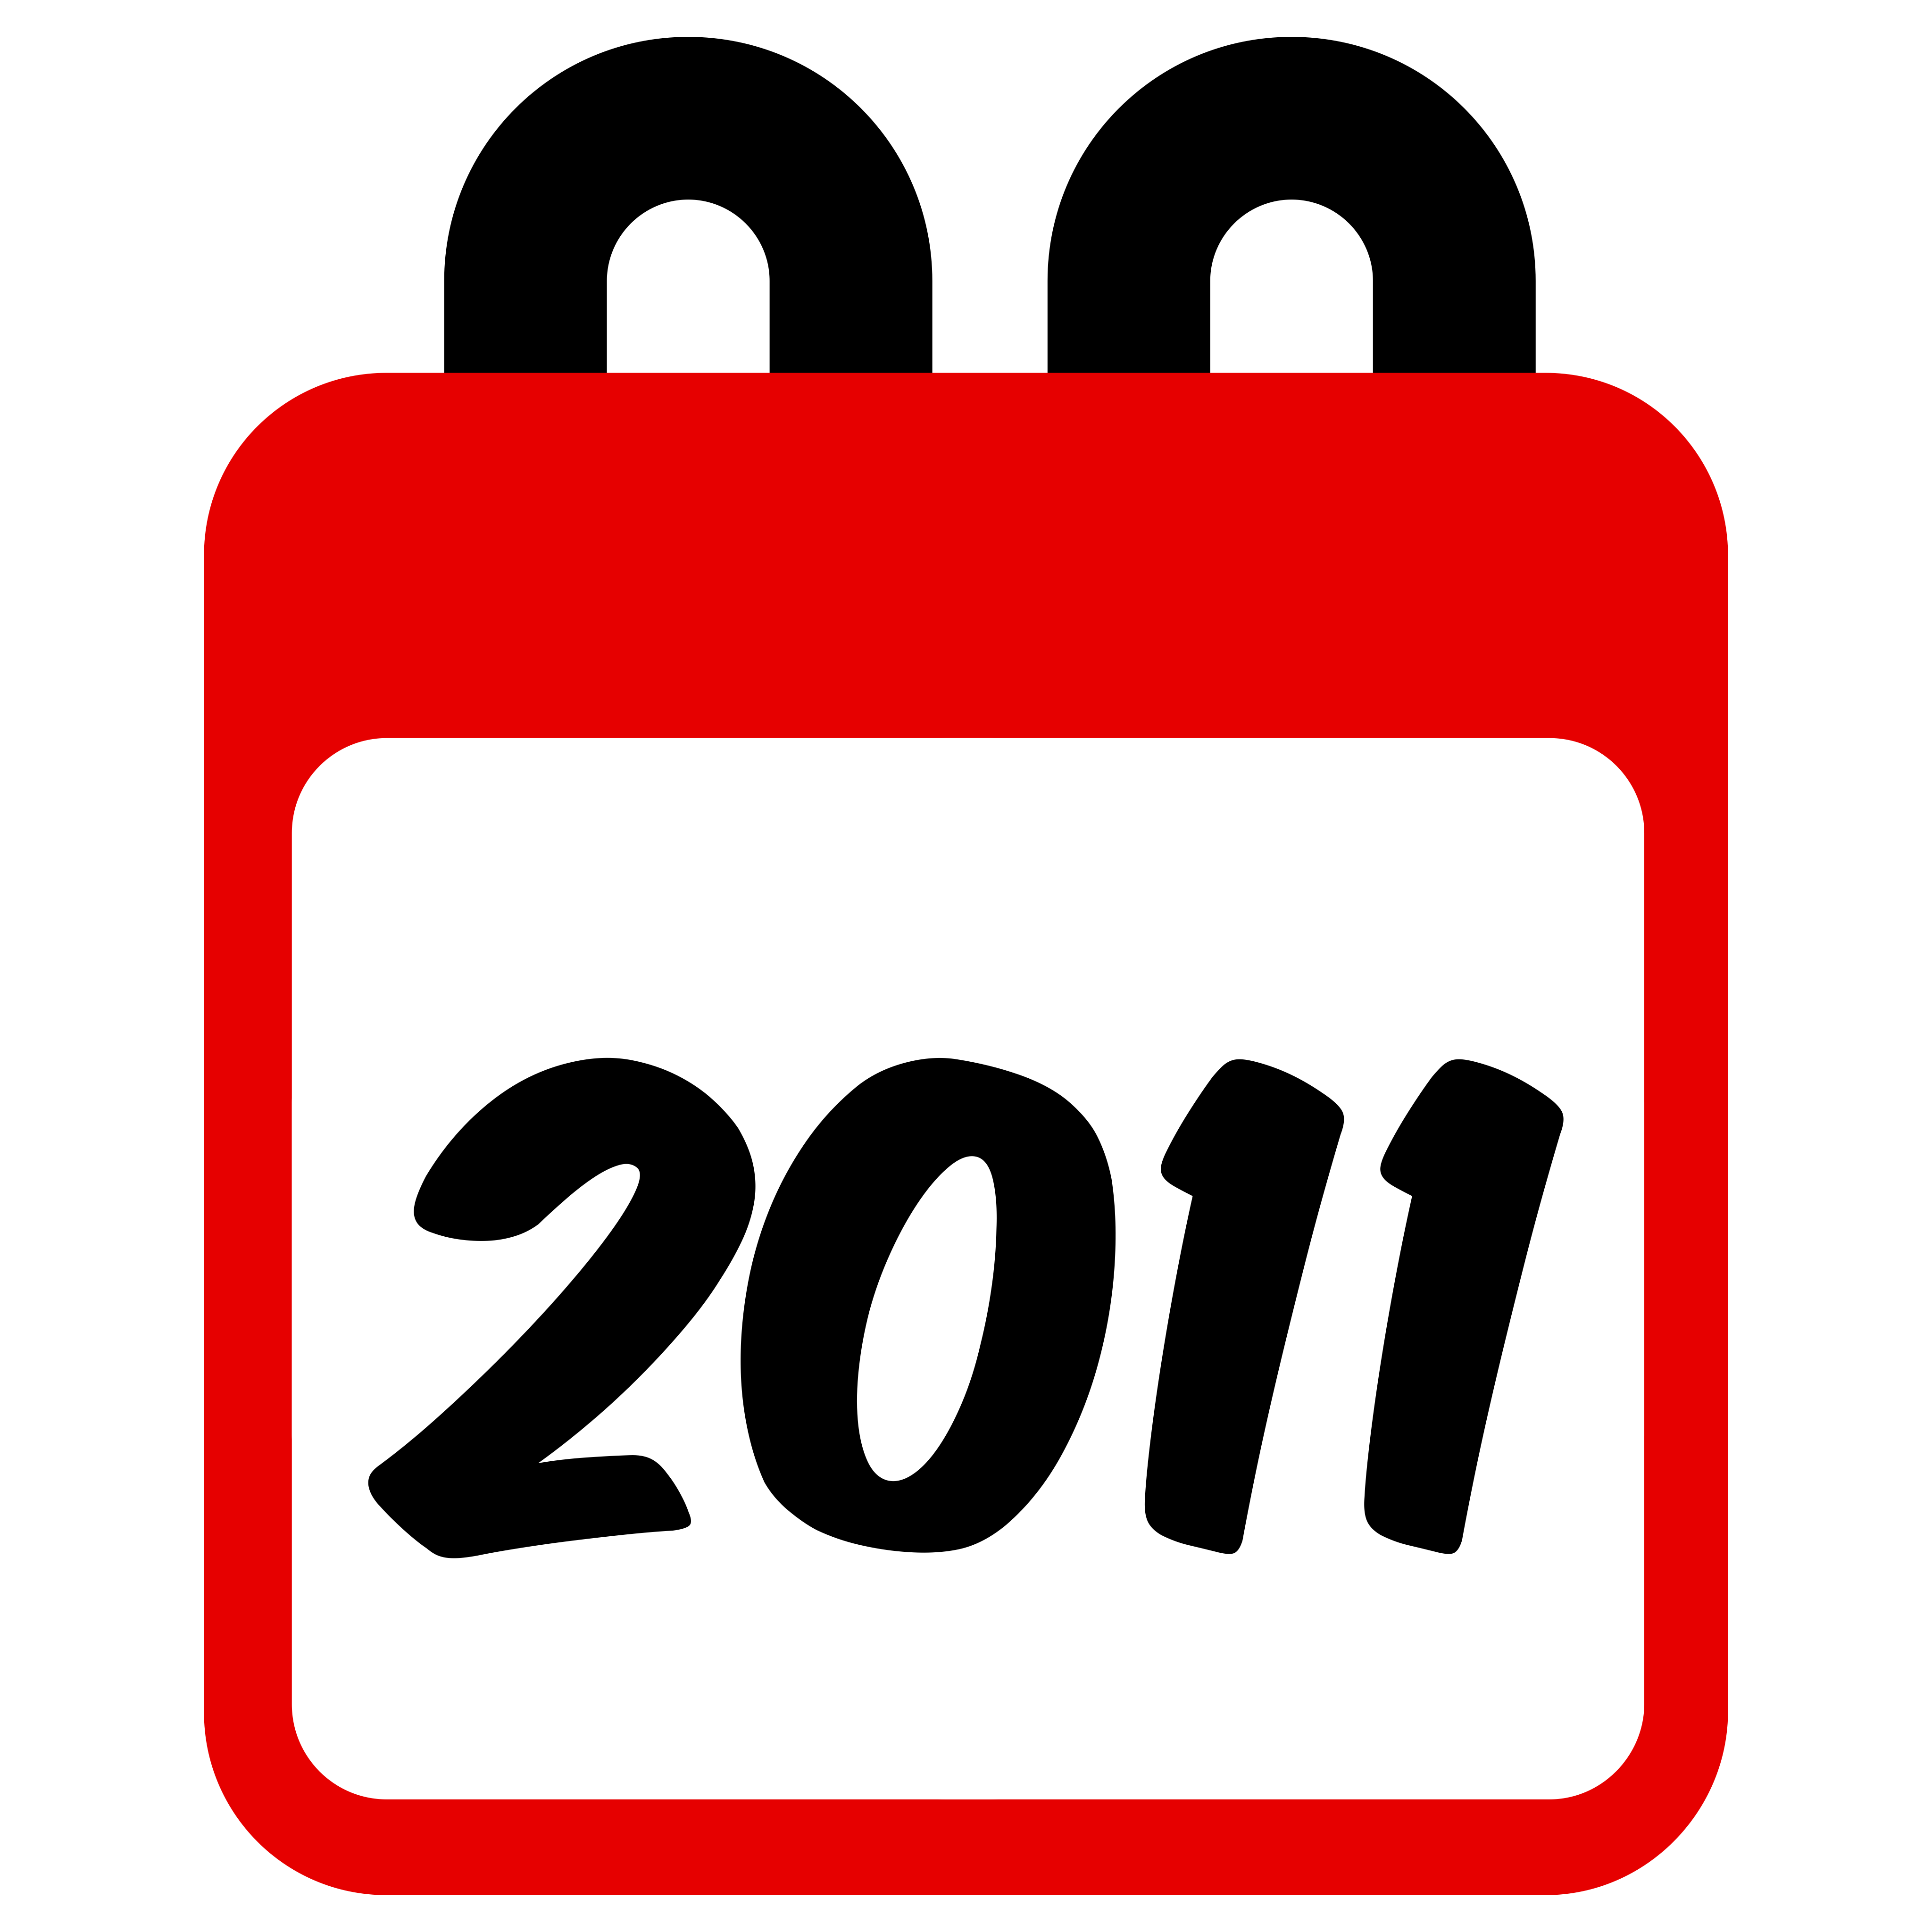 2011 Calendar Graphic